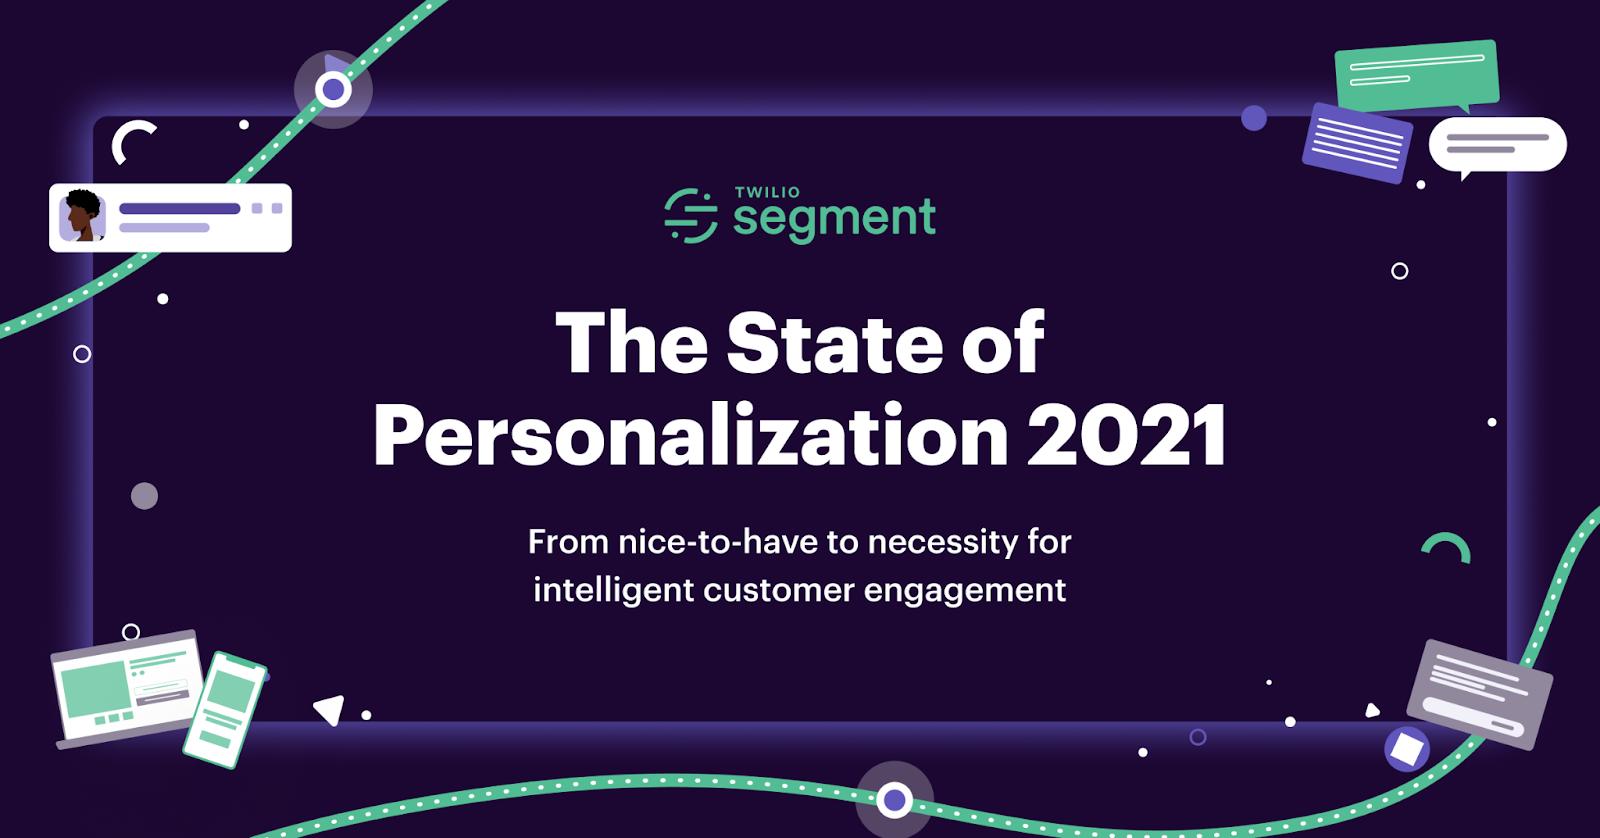 Announcing Twilio Segment's The State of Personalization 2021 Report